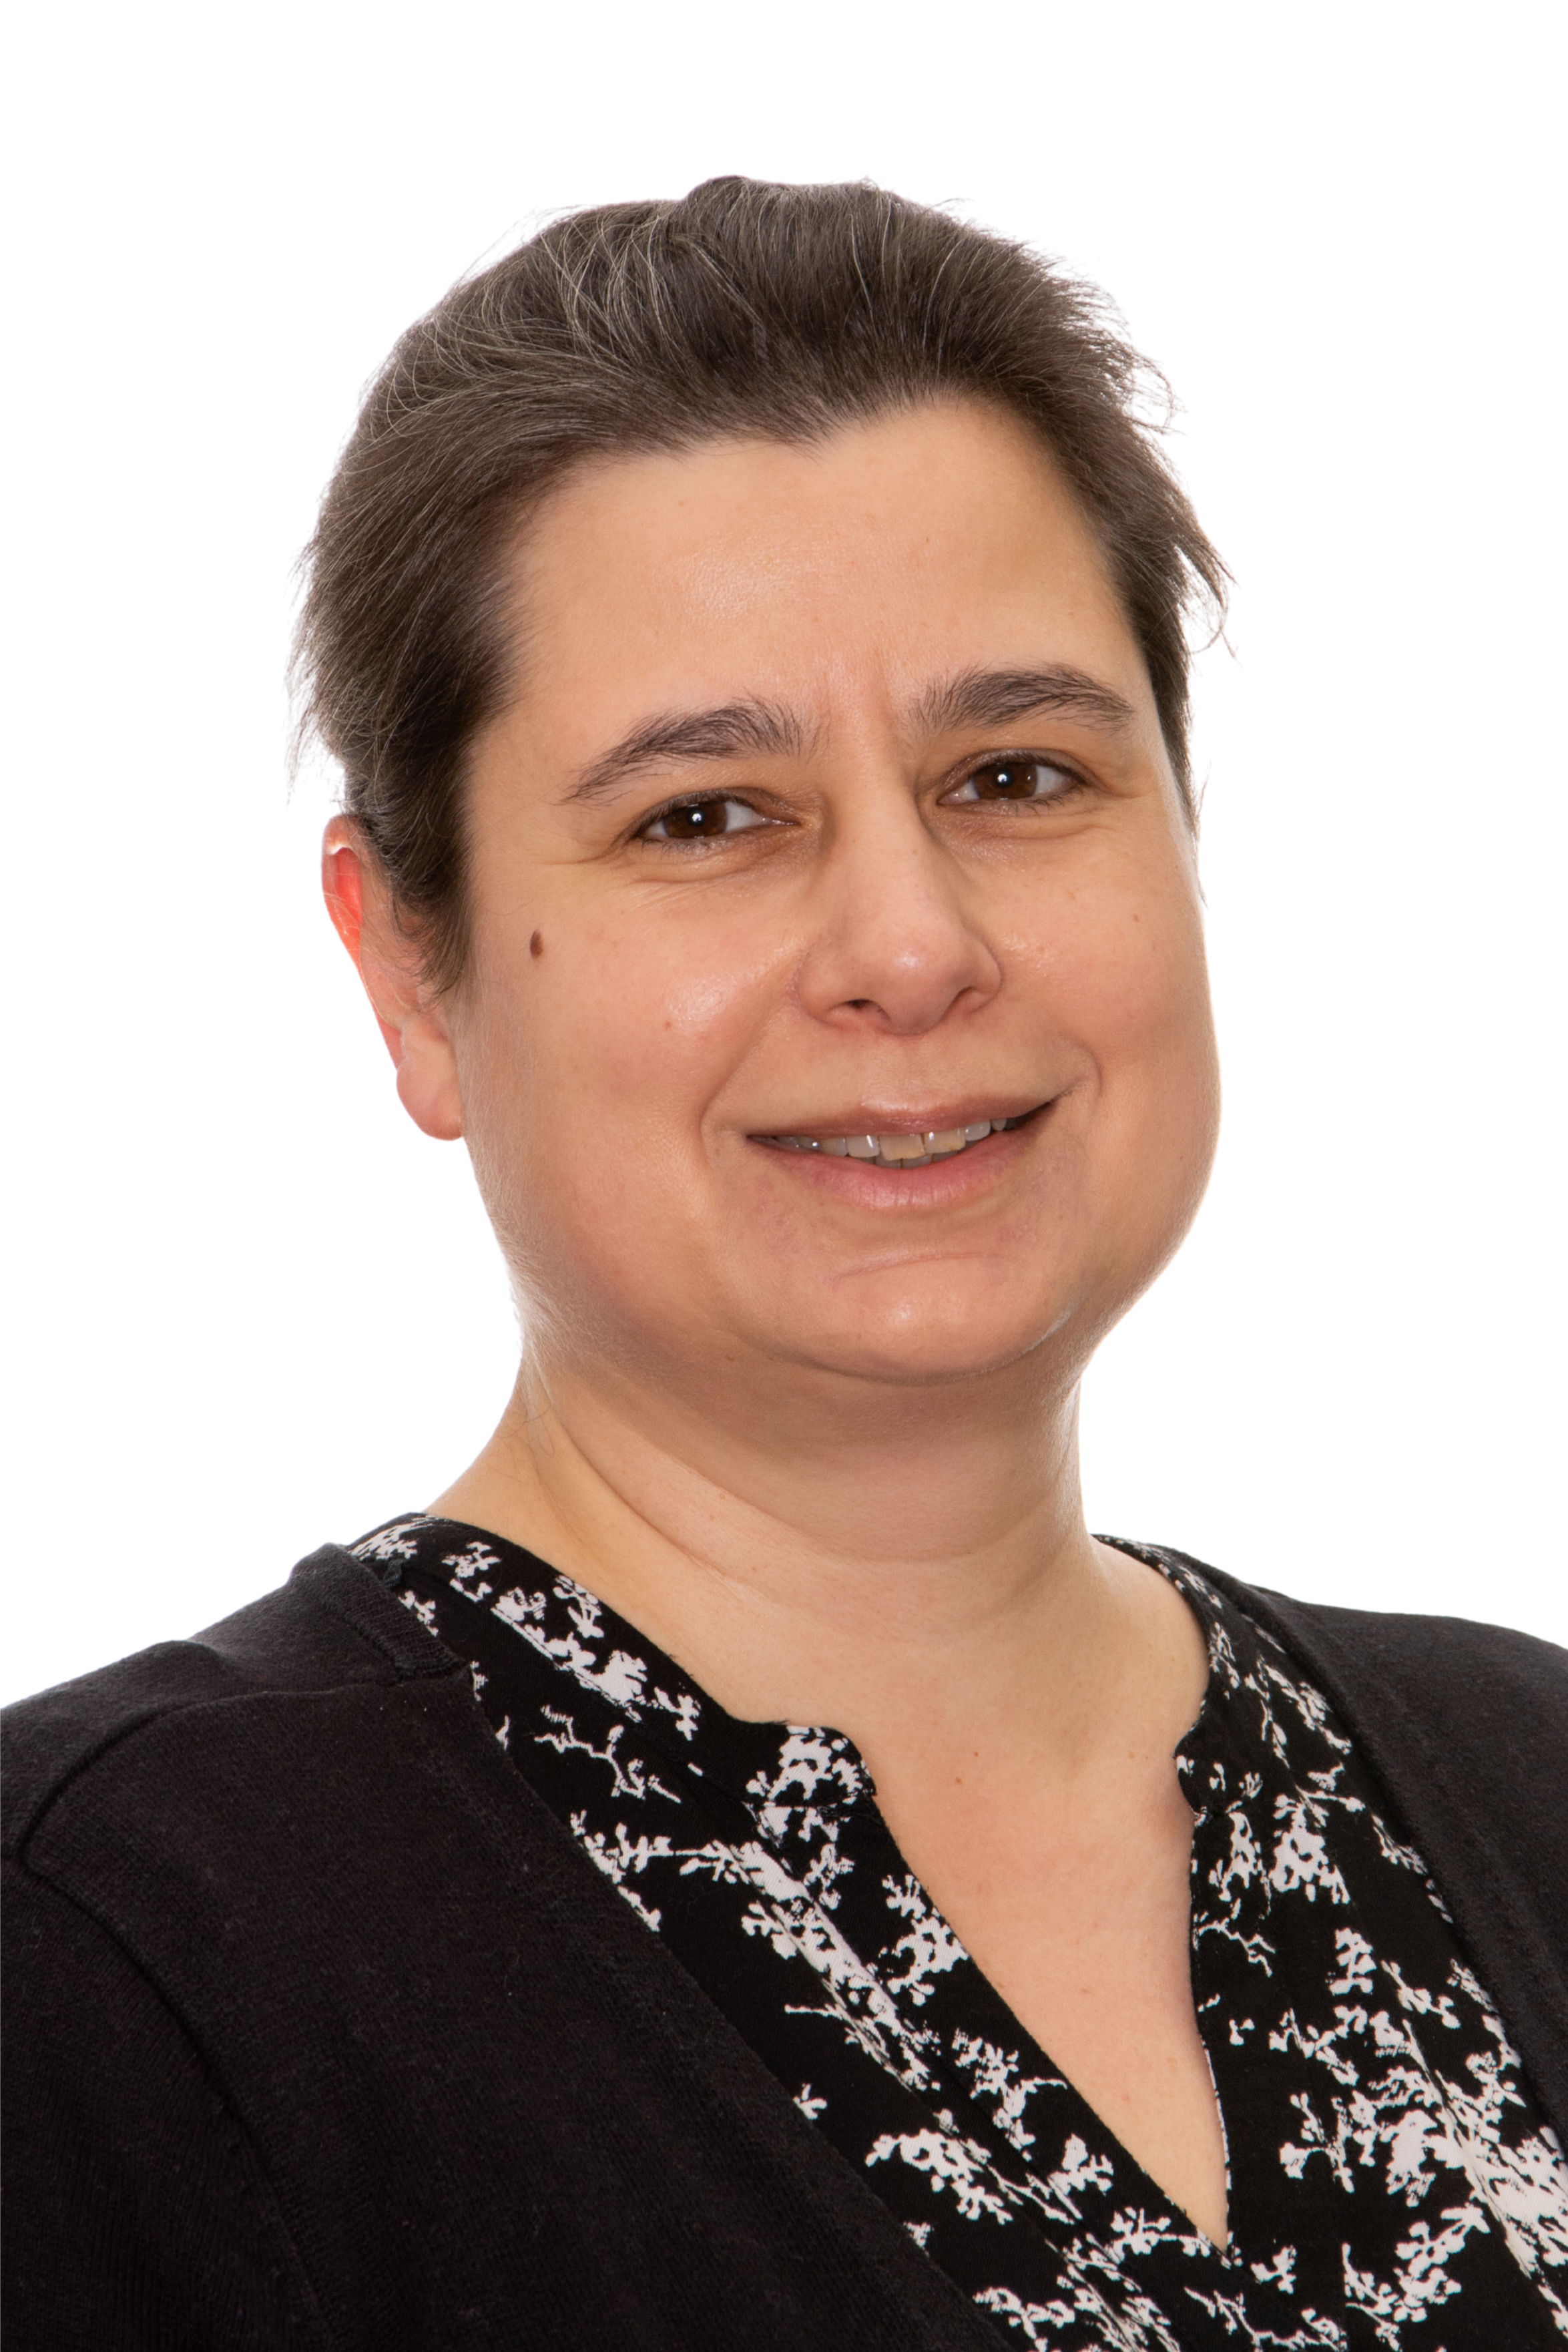 Ulrike Preuß profilbild